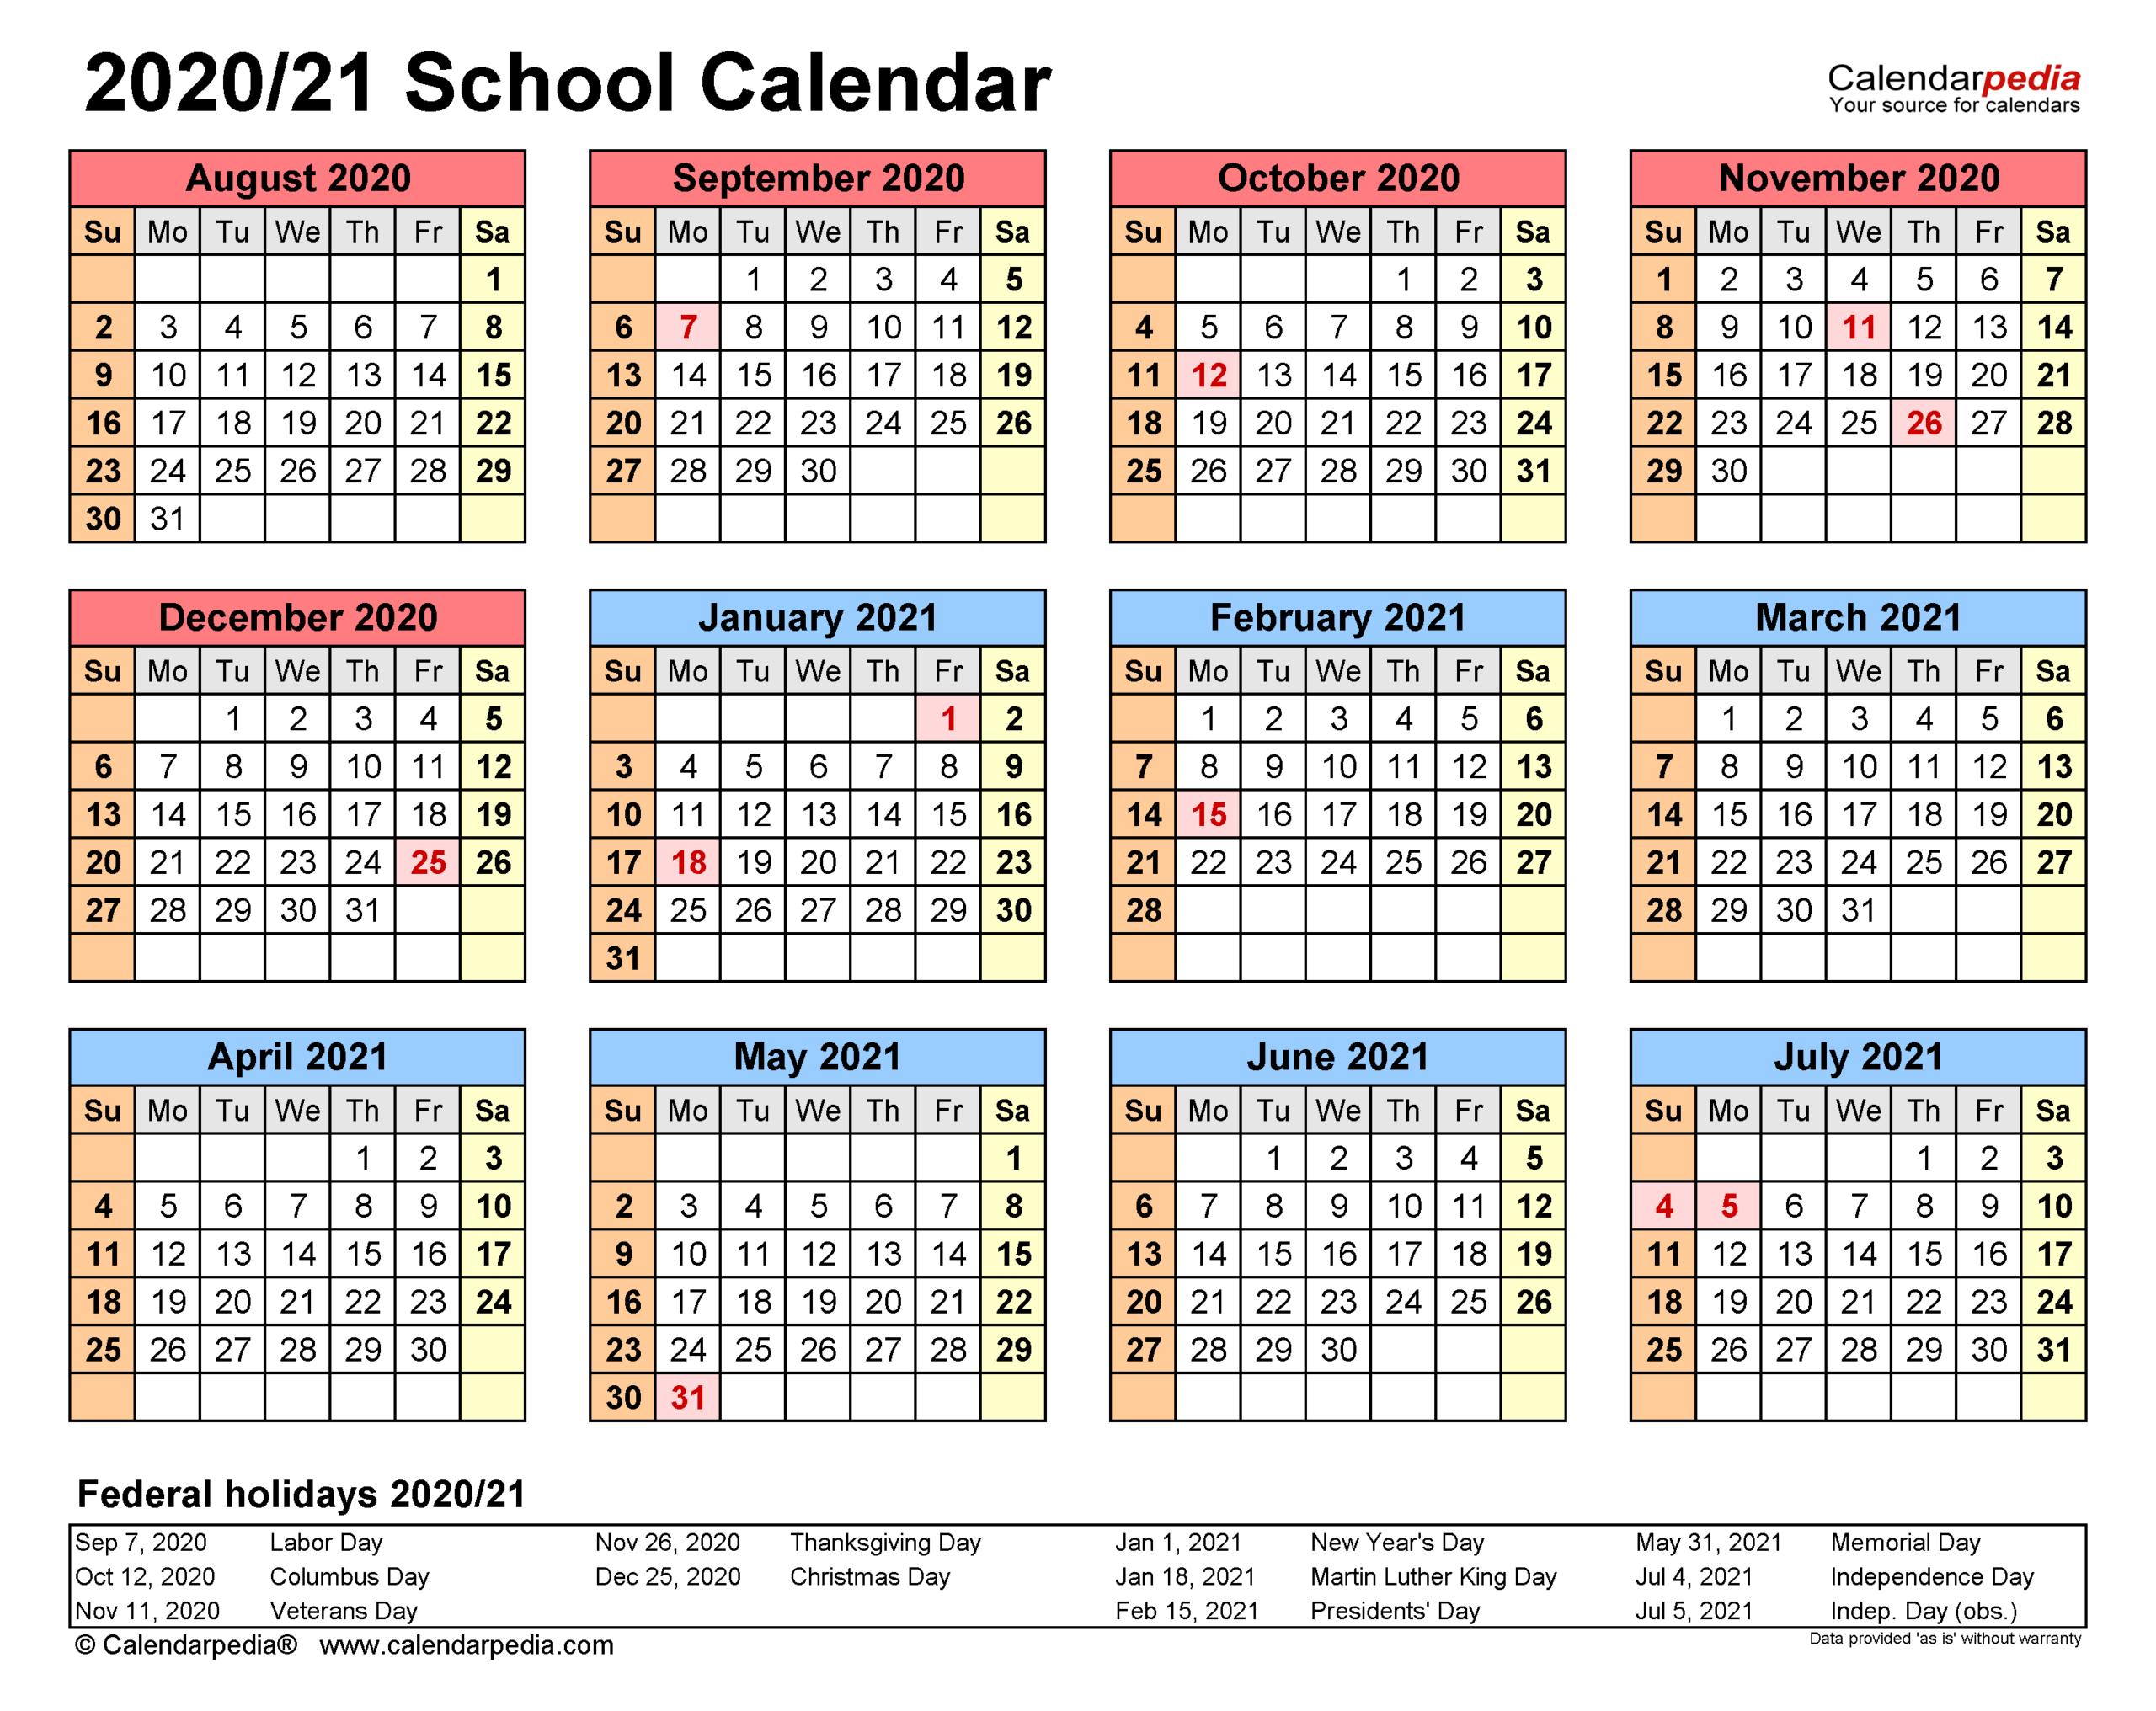 School Calendars 20202021 - Free Printable Excel Templates